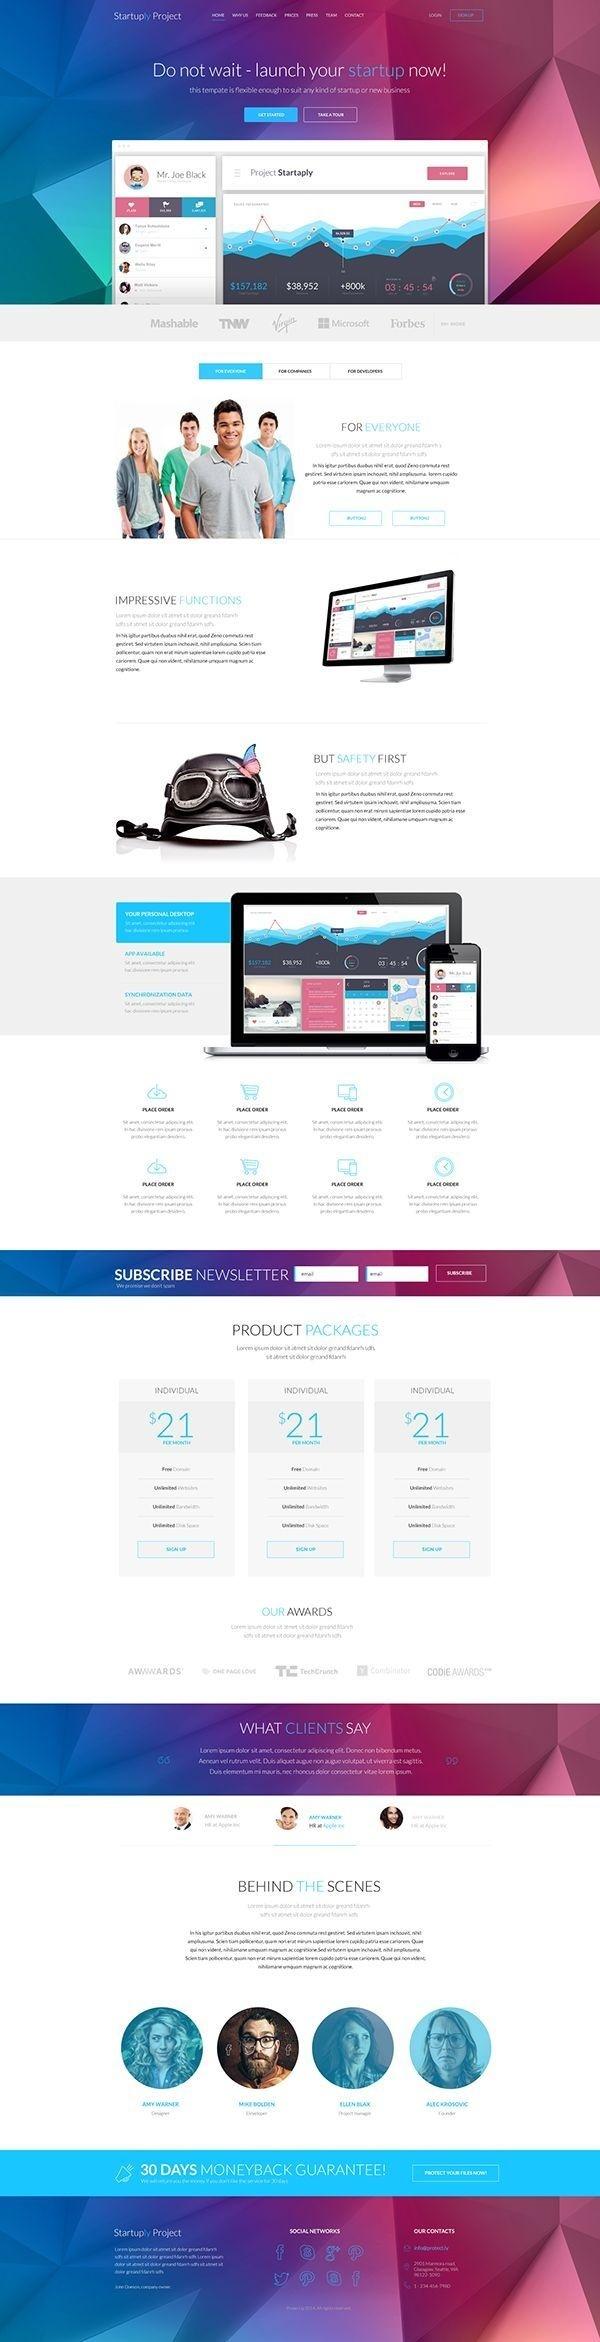 Startuply — Responsive Multi-Purpose Landing Page #page #responsive #design #website #landing